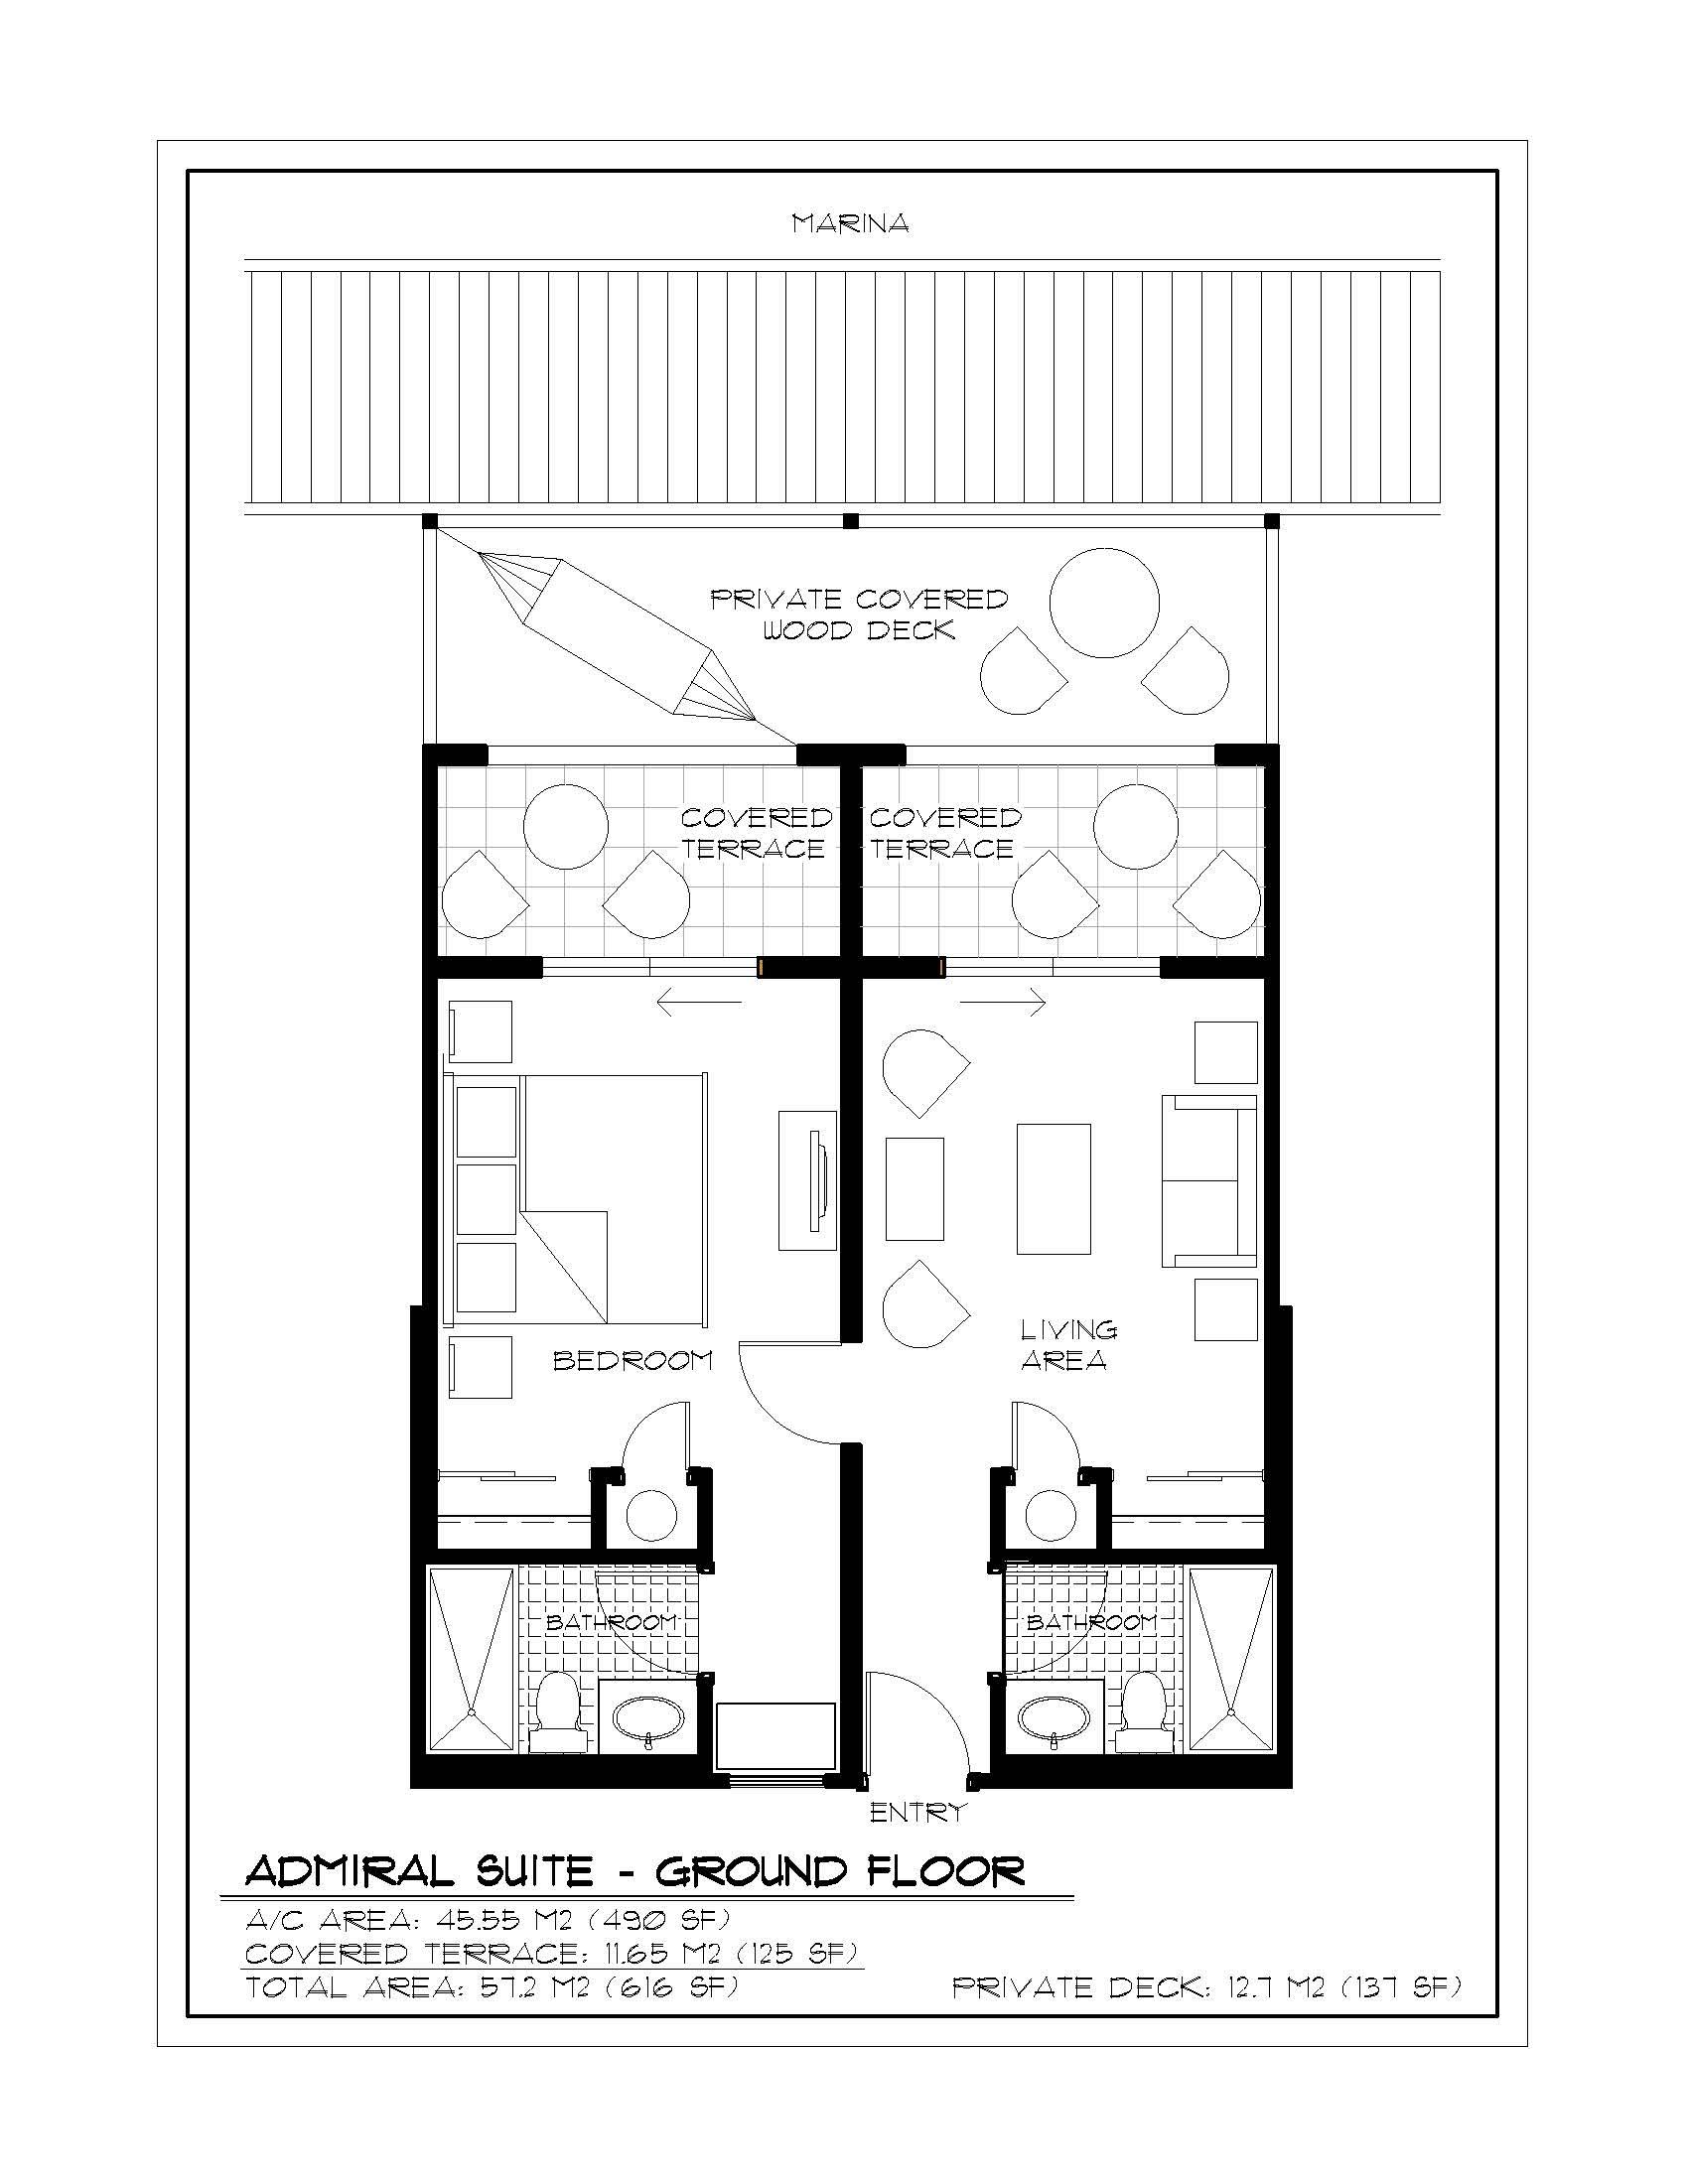 Mini Fridge Diagram - Wiring Diagrams List on